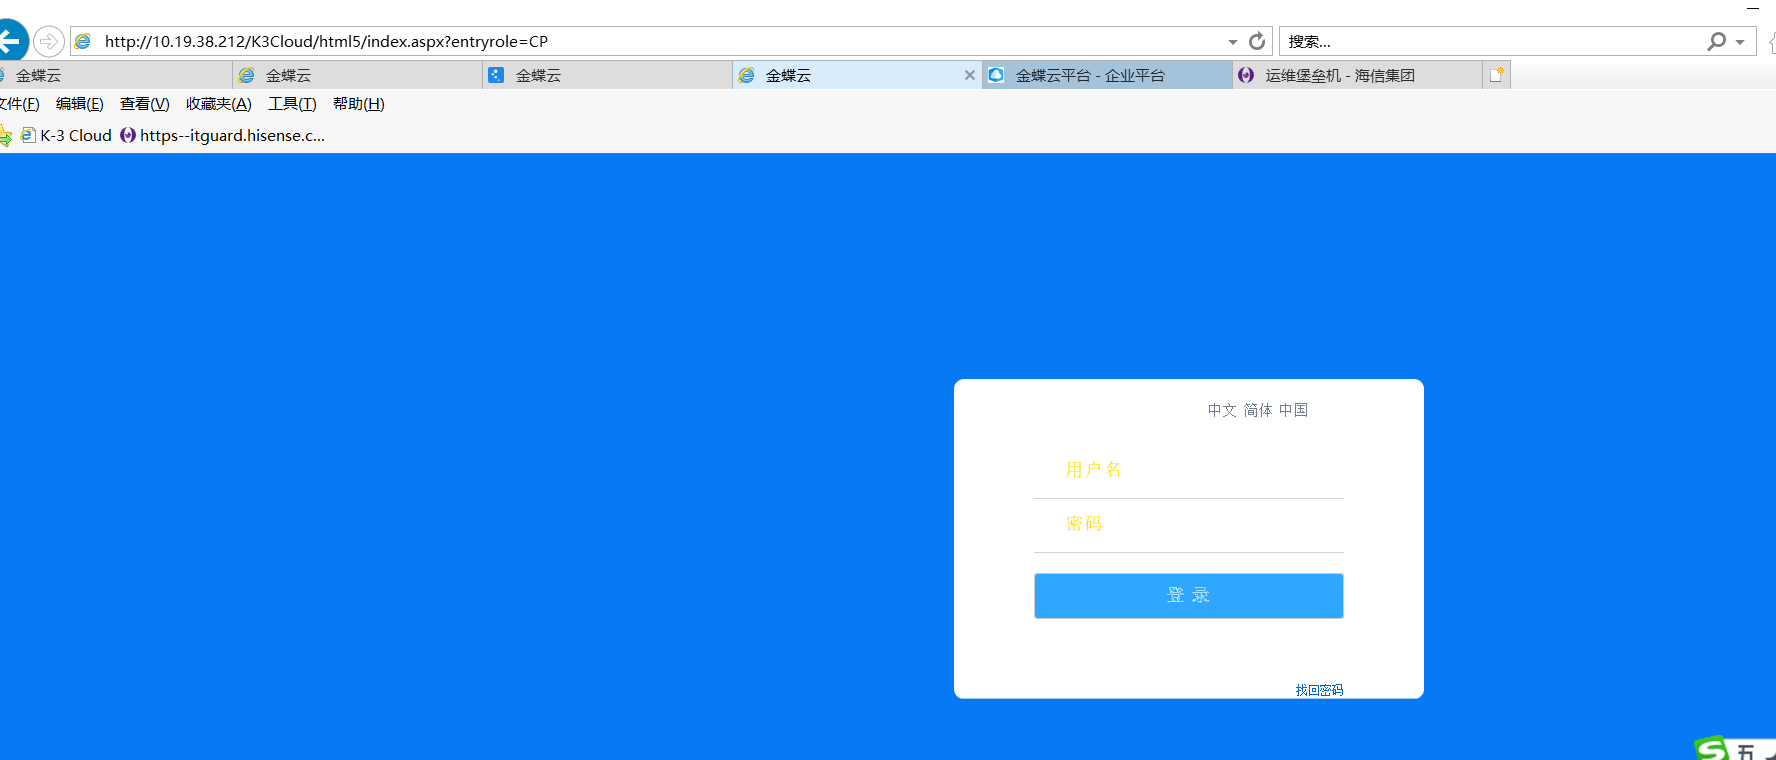 HTML格式登录不上